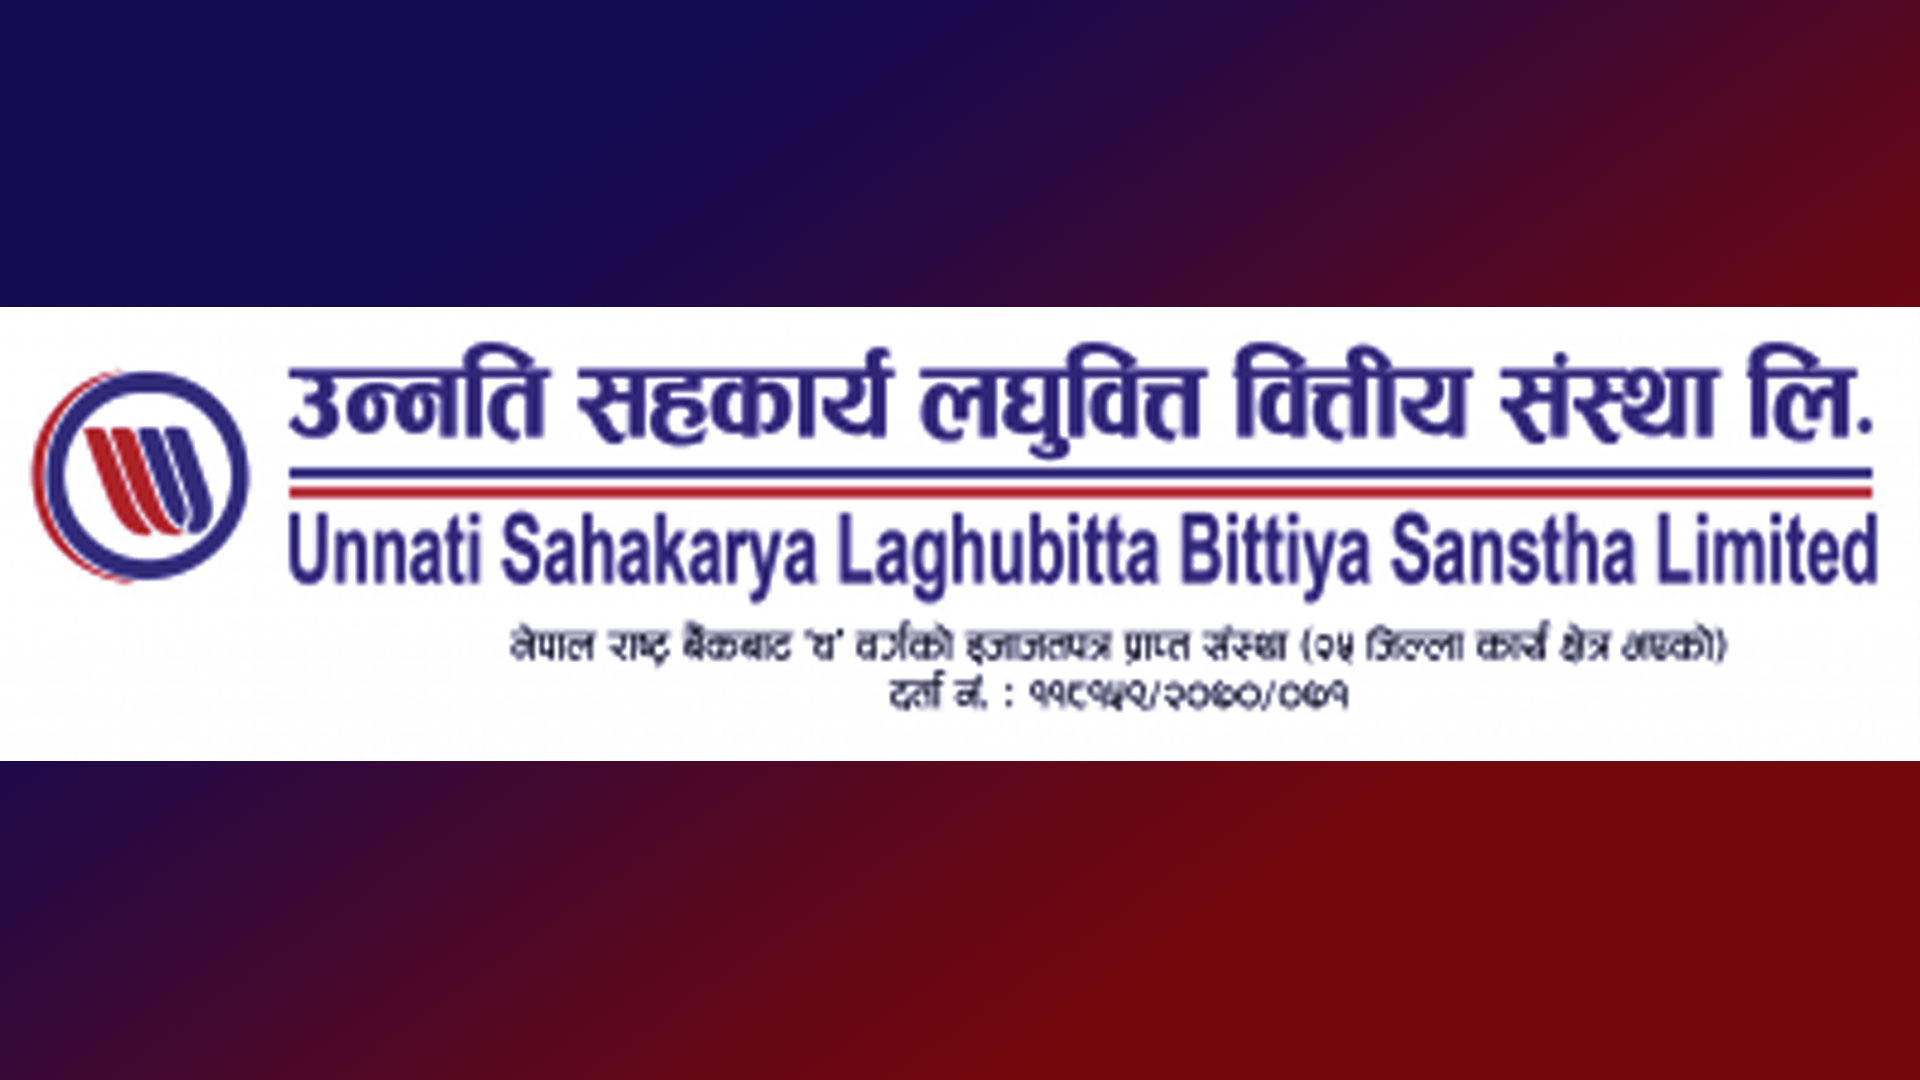 Unnati Sahakarya Laghubitta